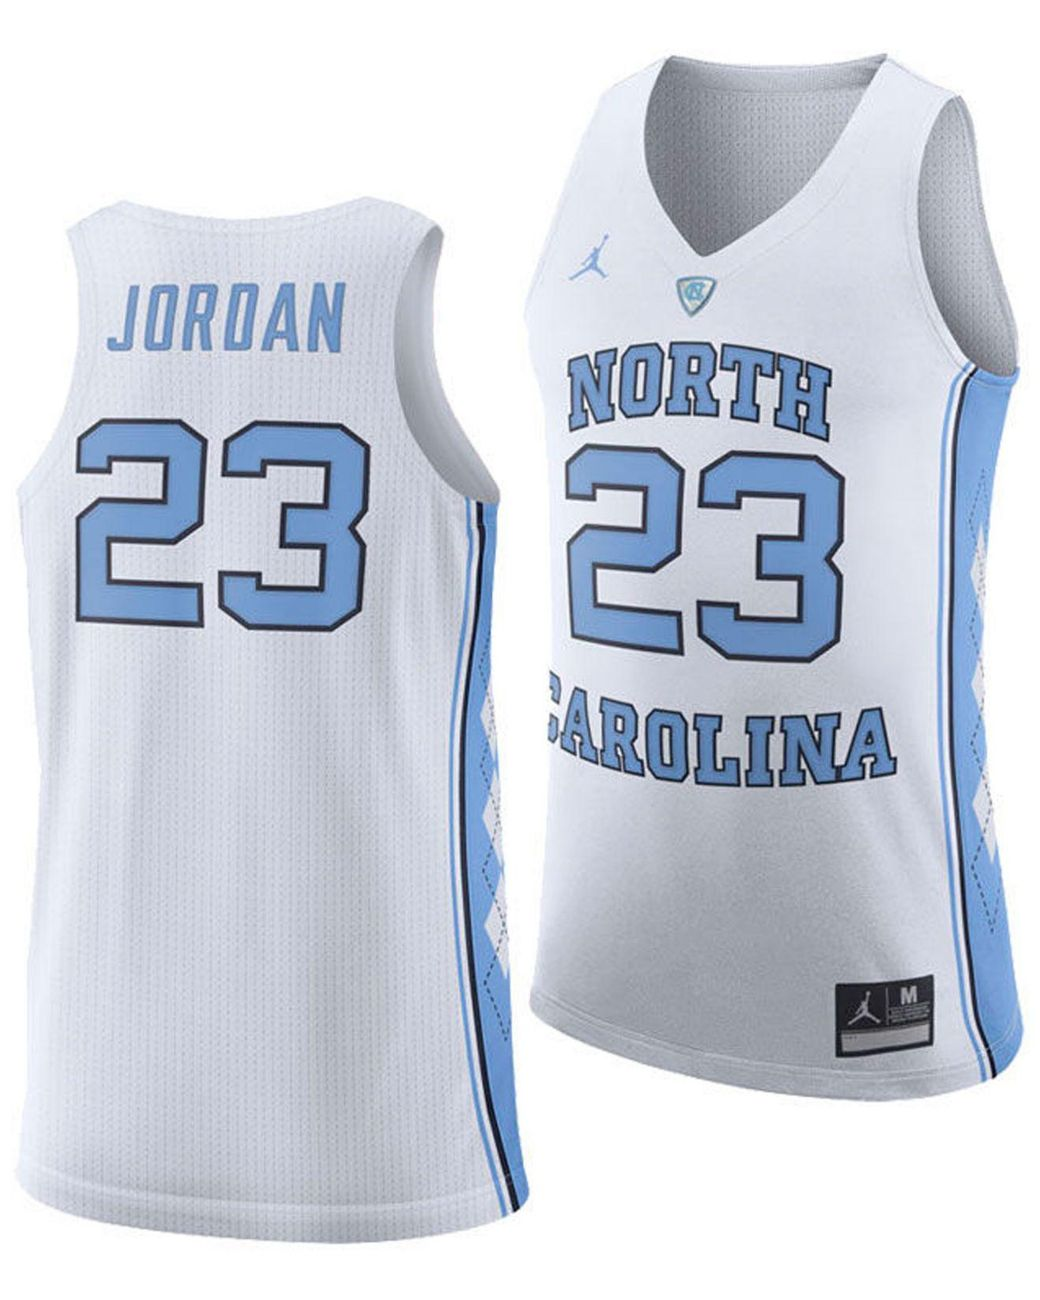 low priced c9a88 41559 Men's White Michael Jordan North Carolina Tar Heels Authentic Basketball  Jersey